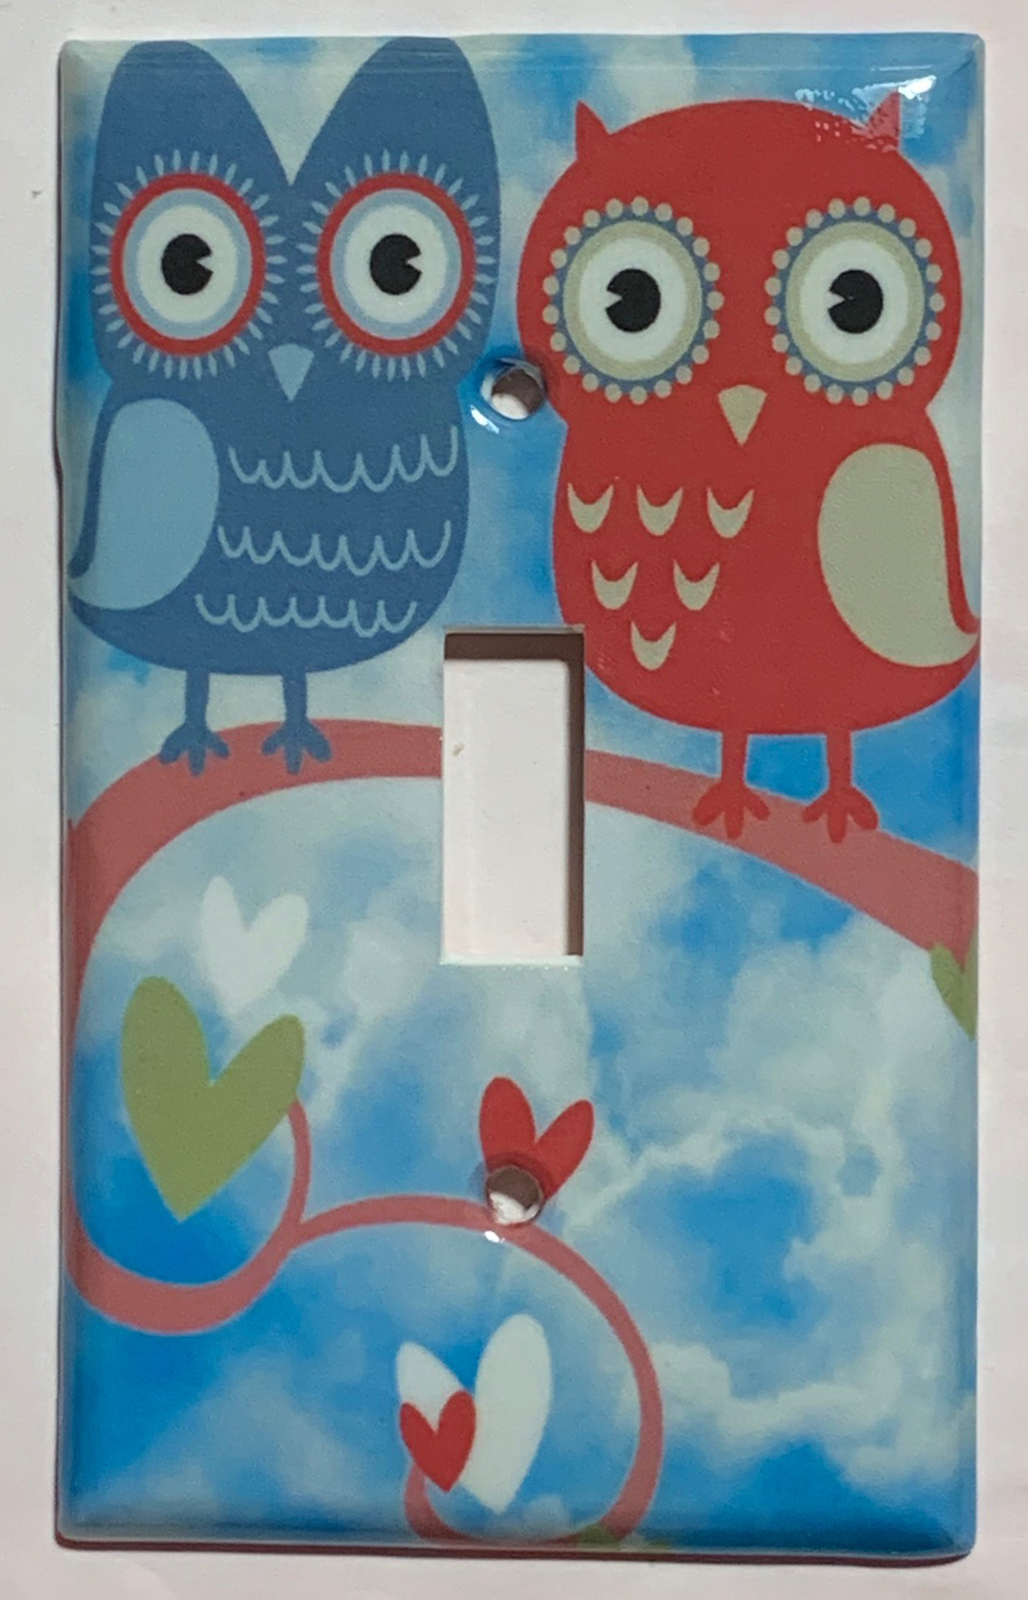 Owl patterns love single toggle